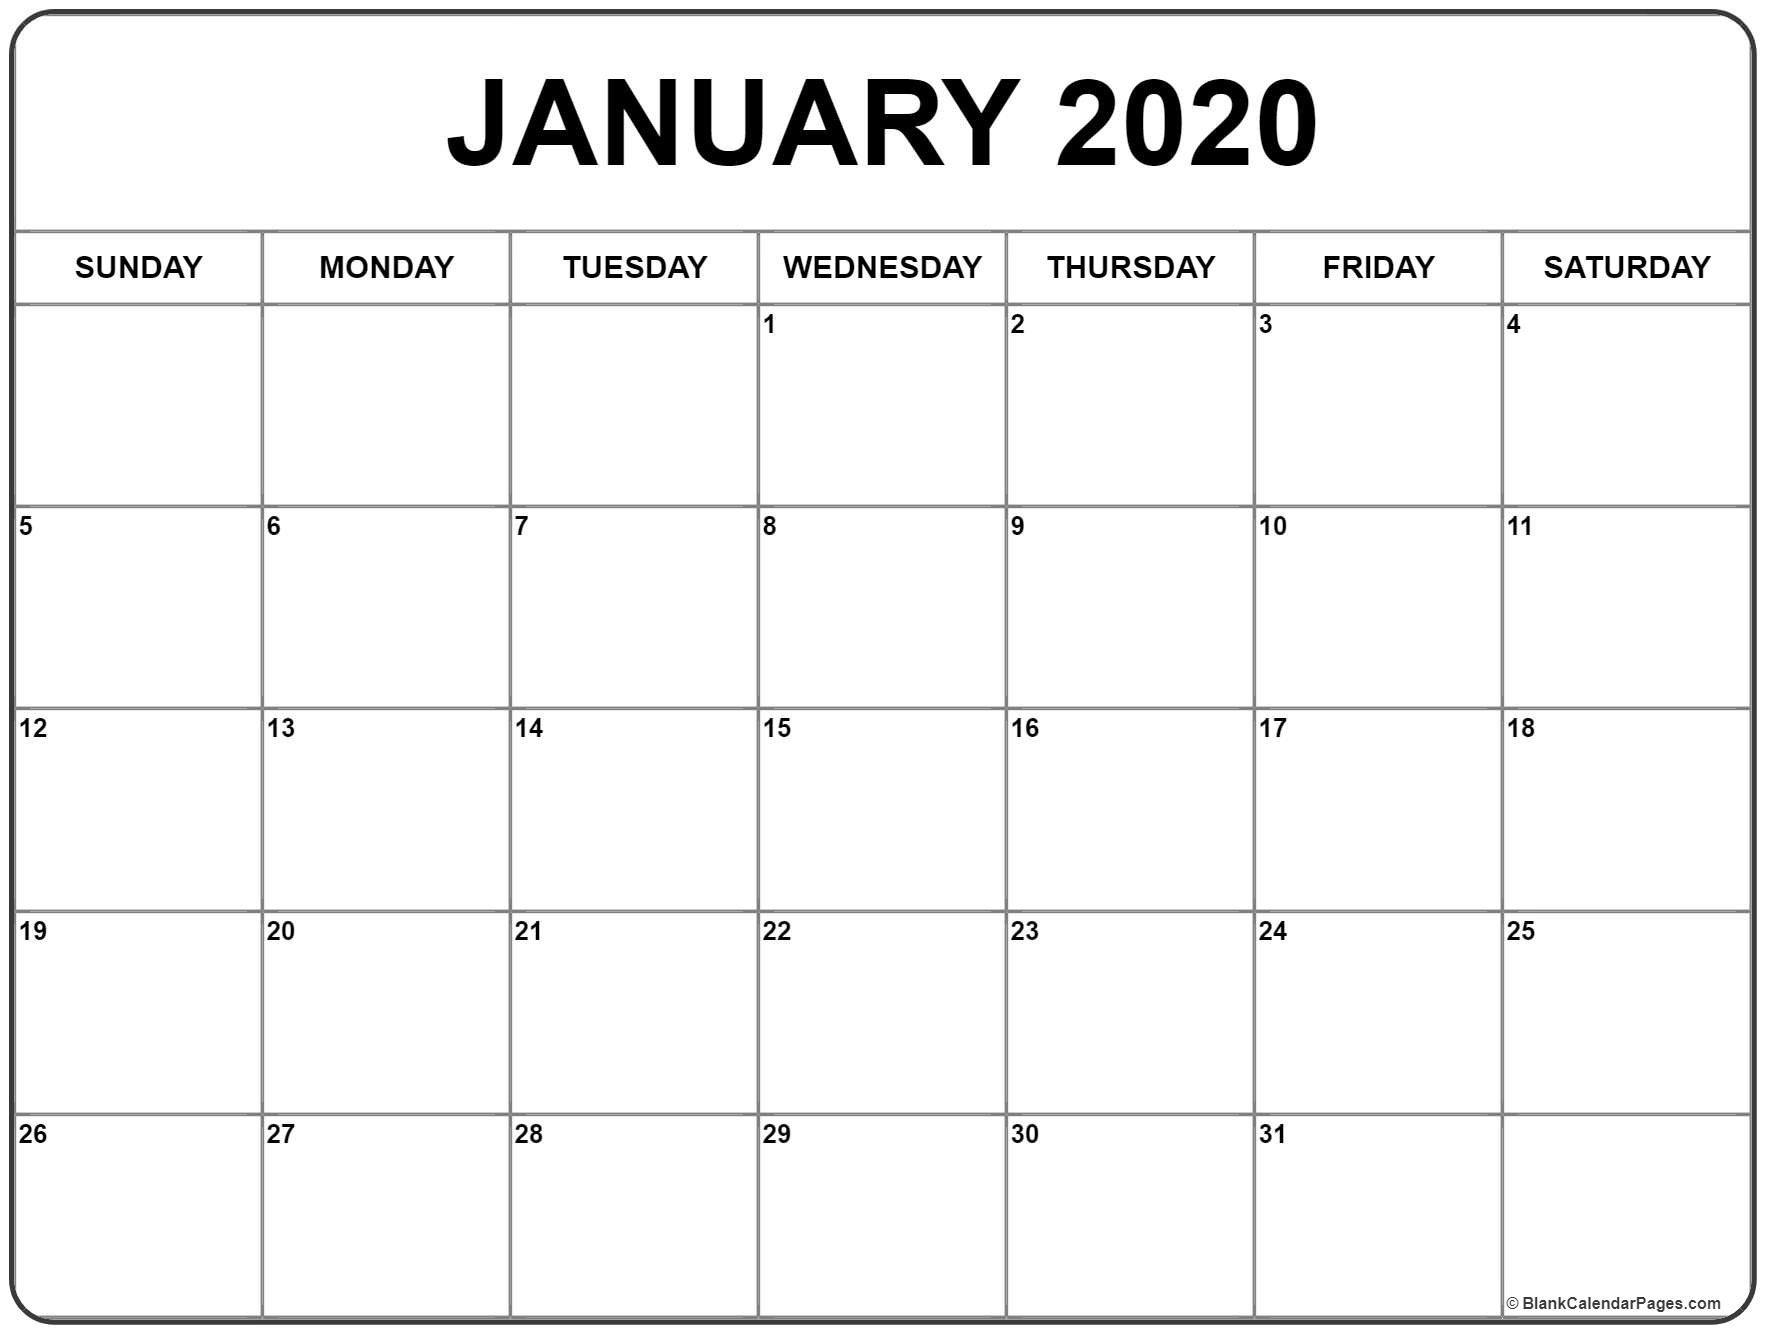 8 X 14 Calendar Printable | Example Calendar Printable Make Of Copy Of Blank Monthly Calendar 8 1/2 By 11